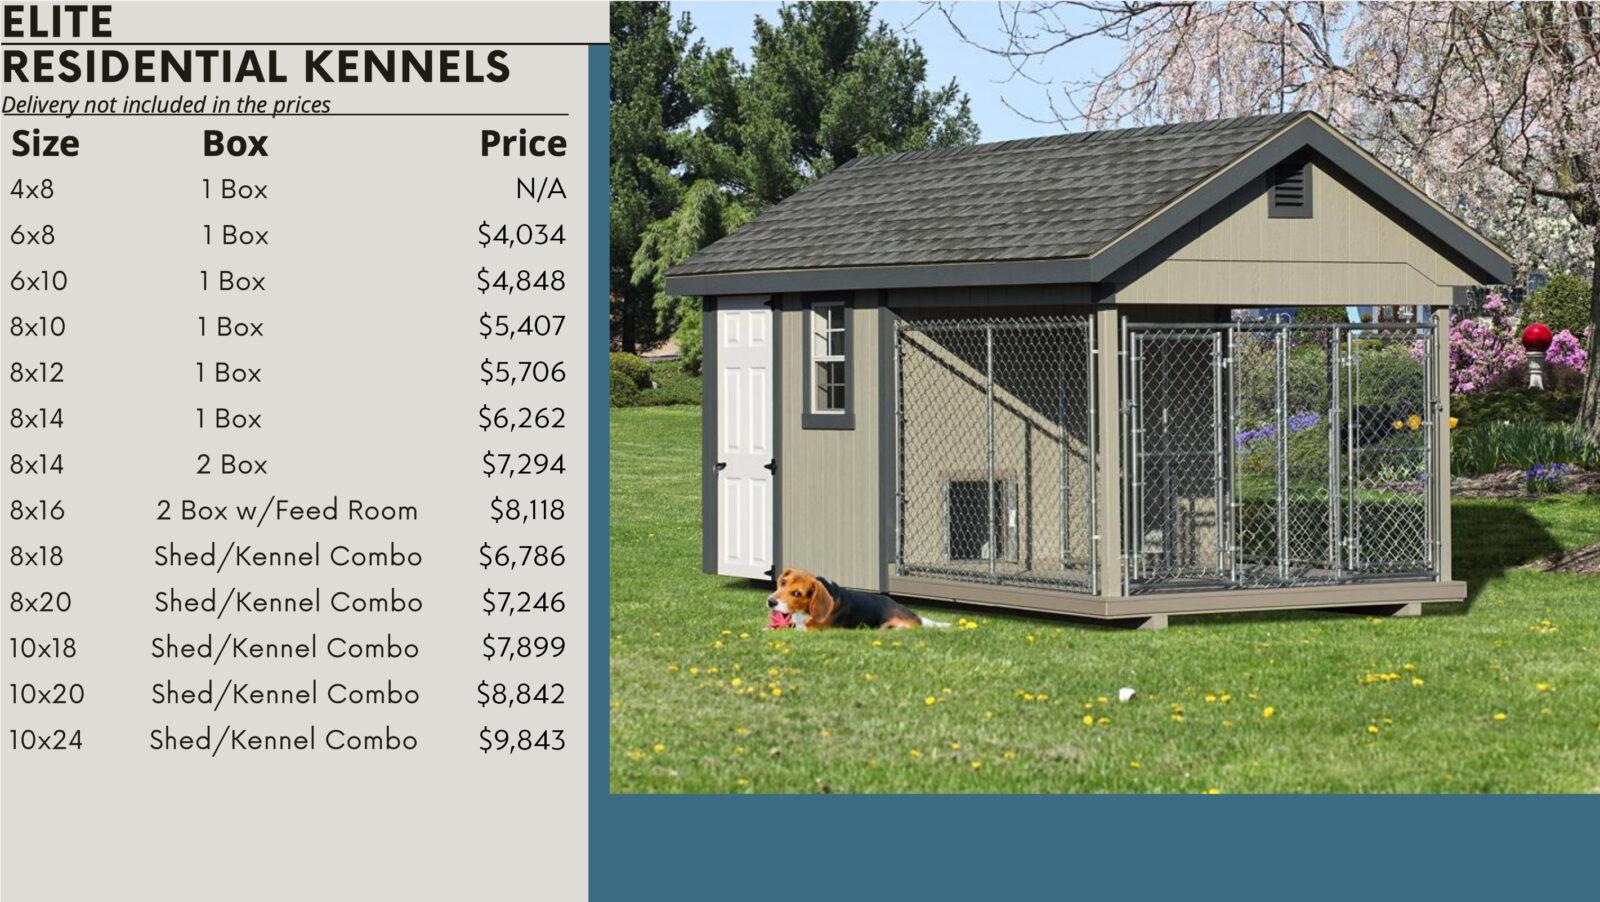 elite kennel prices